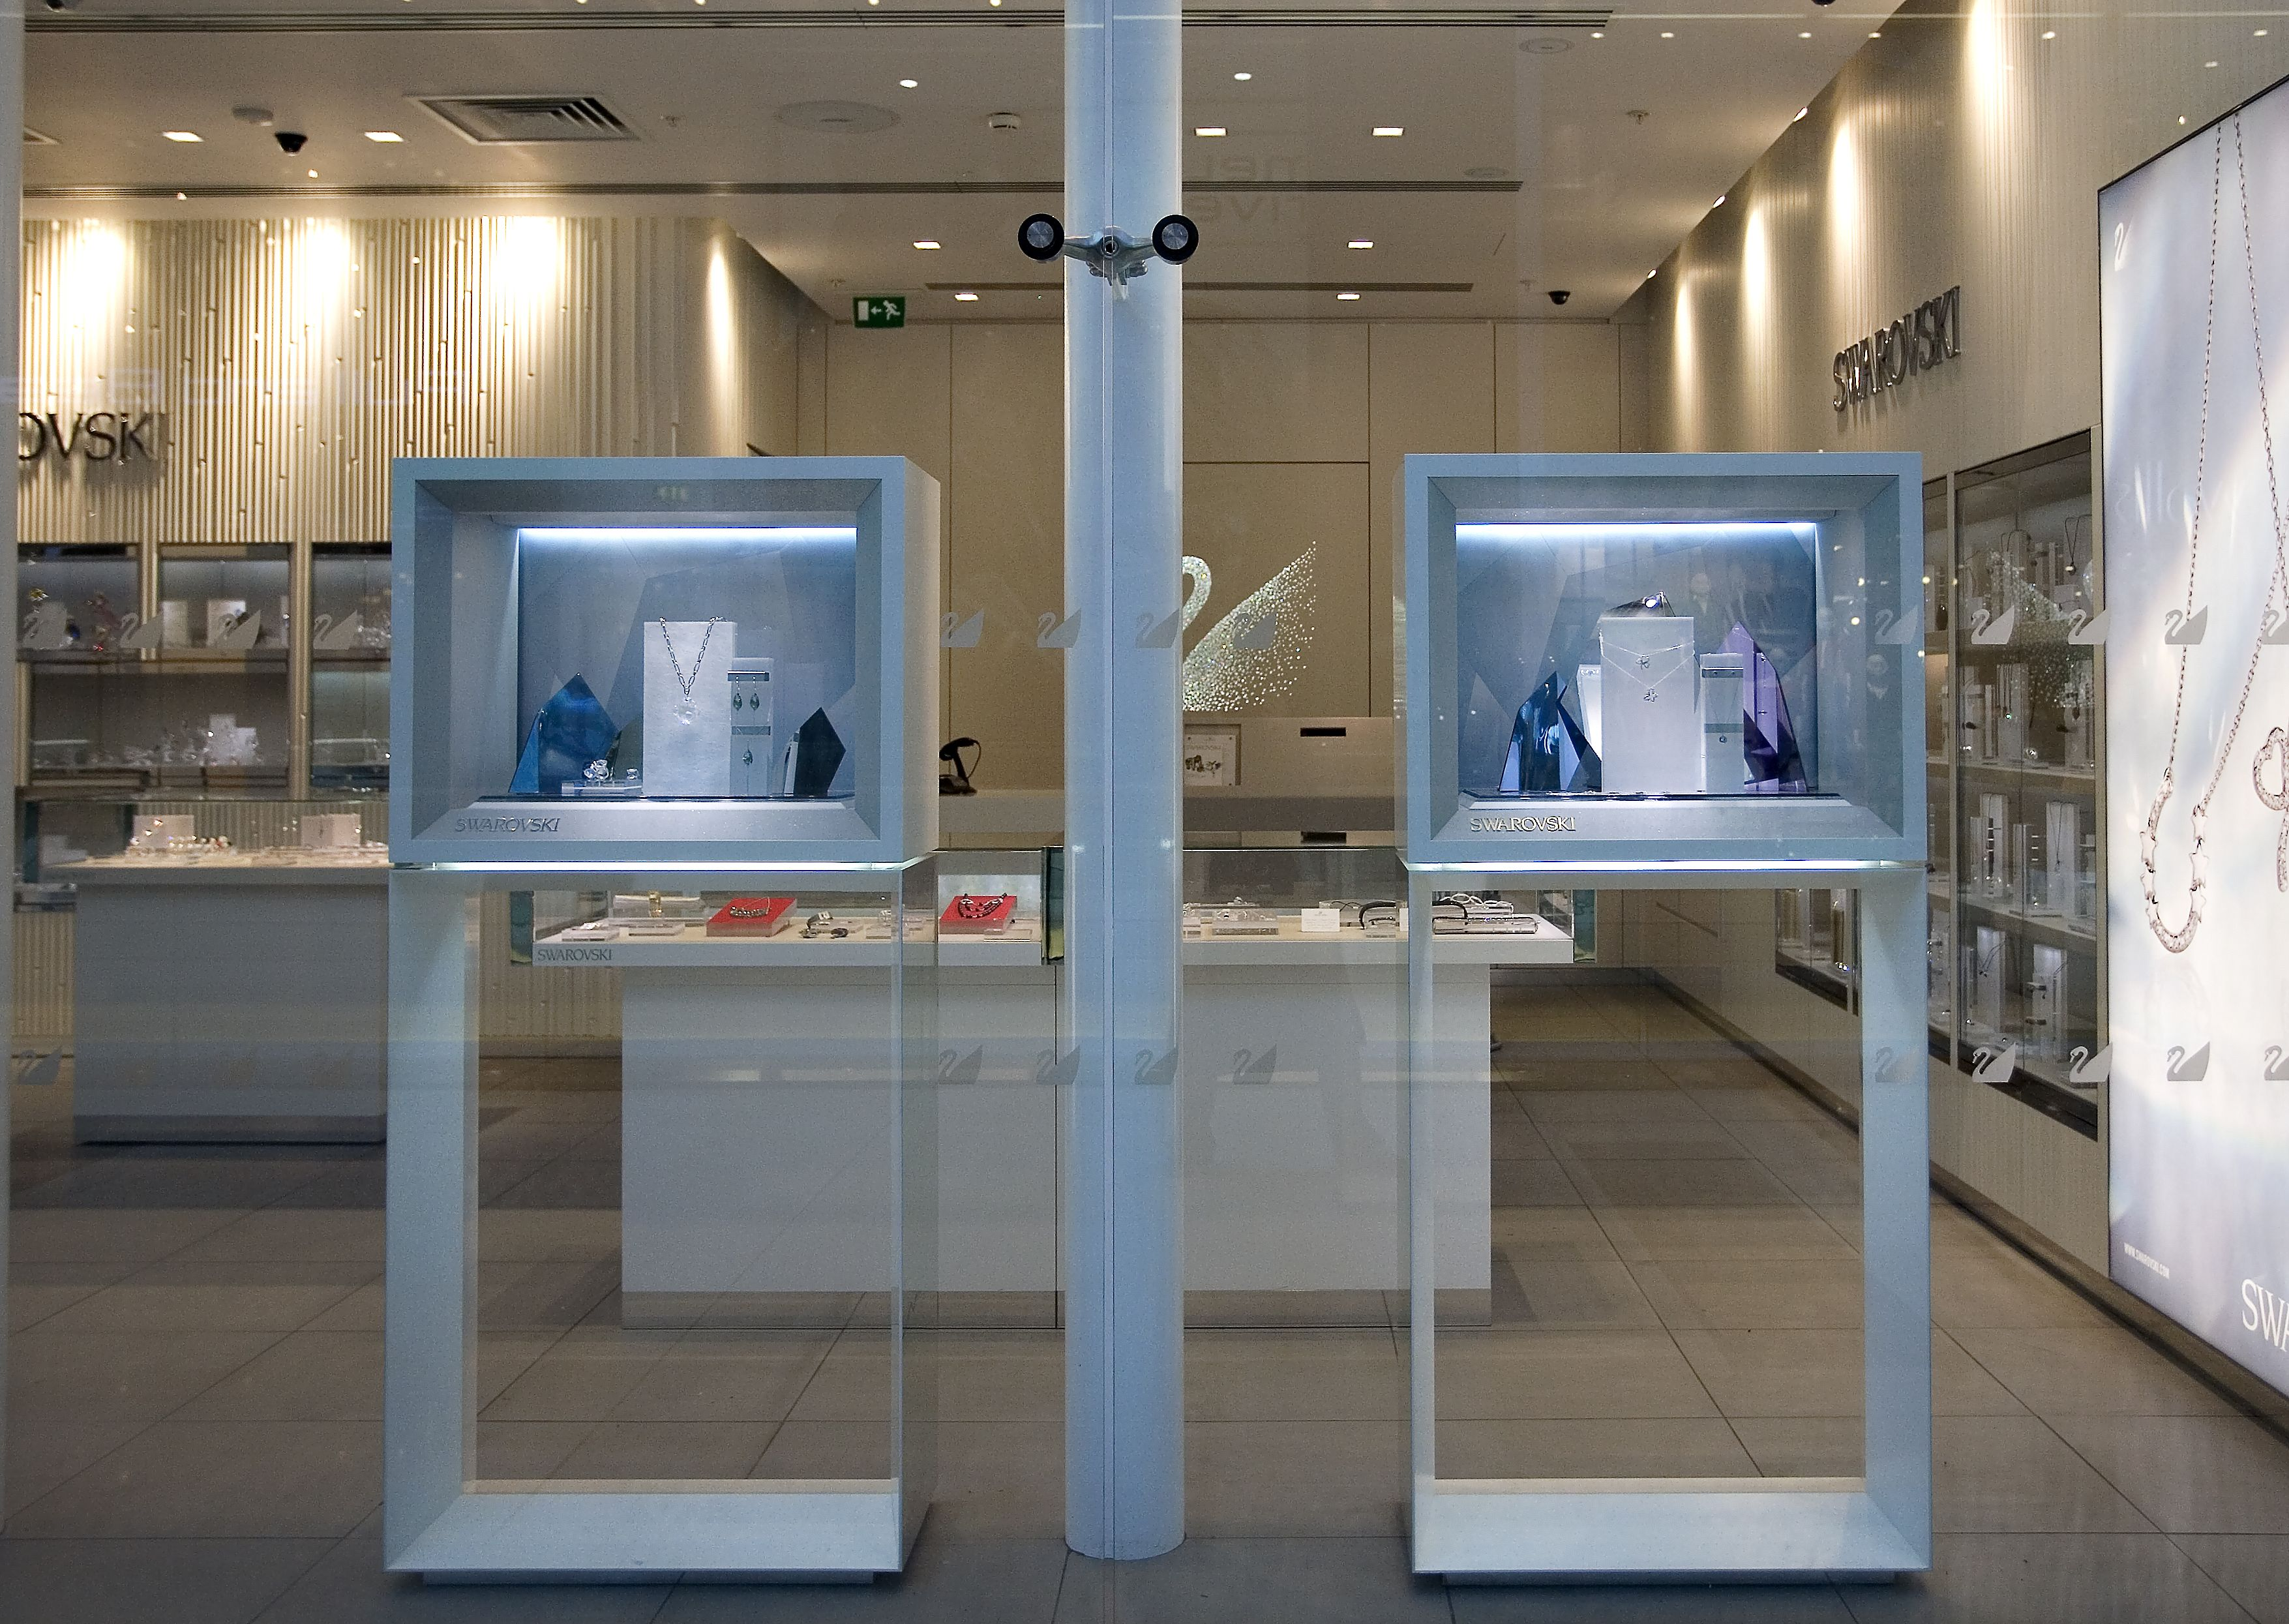 Swarovski Display by Elemental Design. & Swarovski Display by Elemental Design. | gioielleria | Pinterest ...